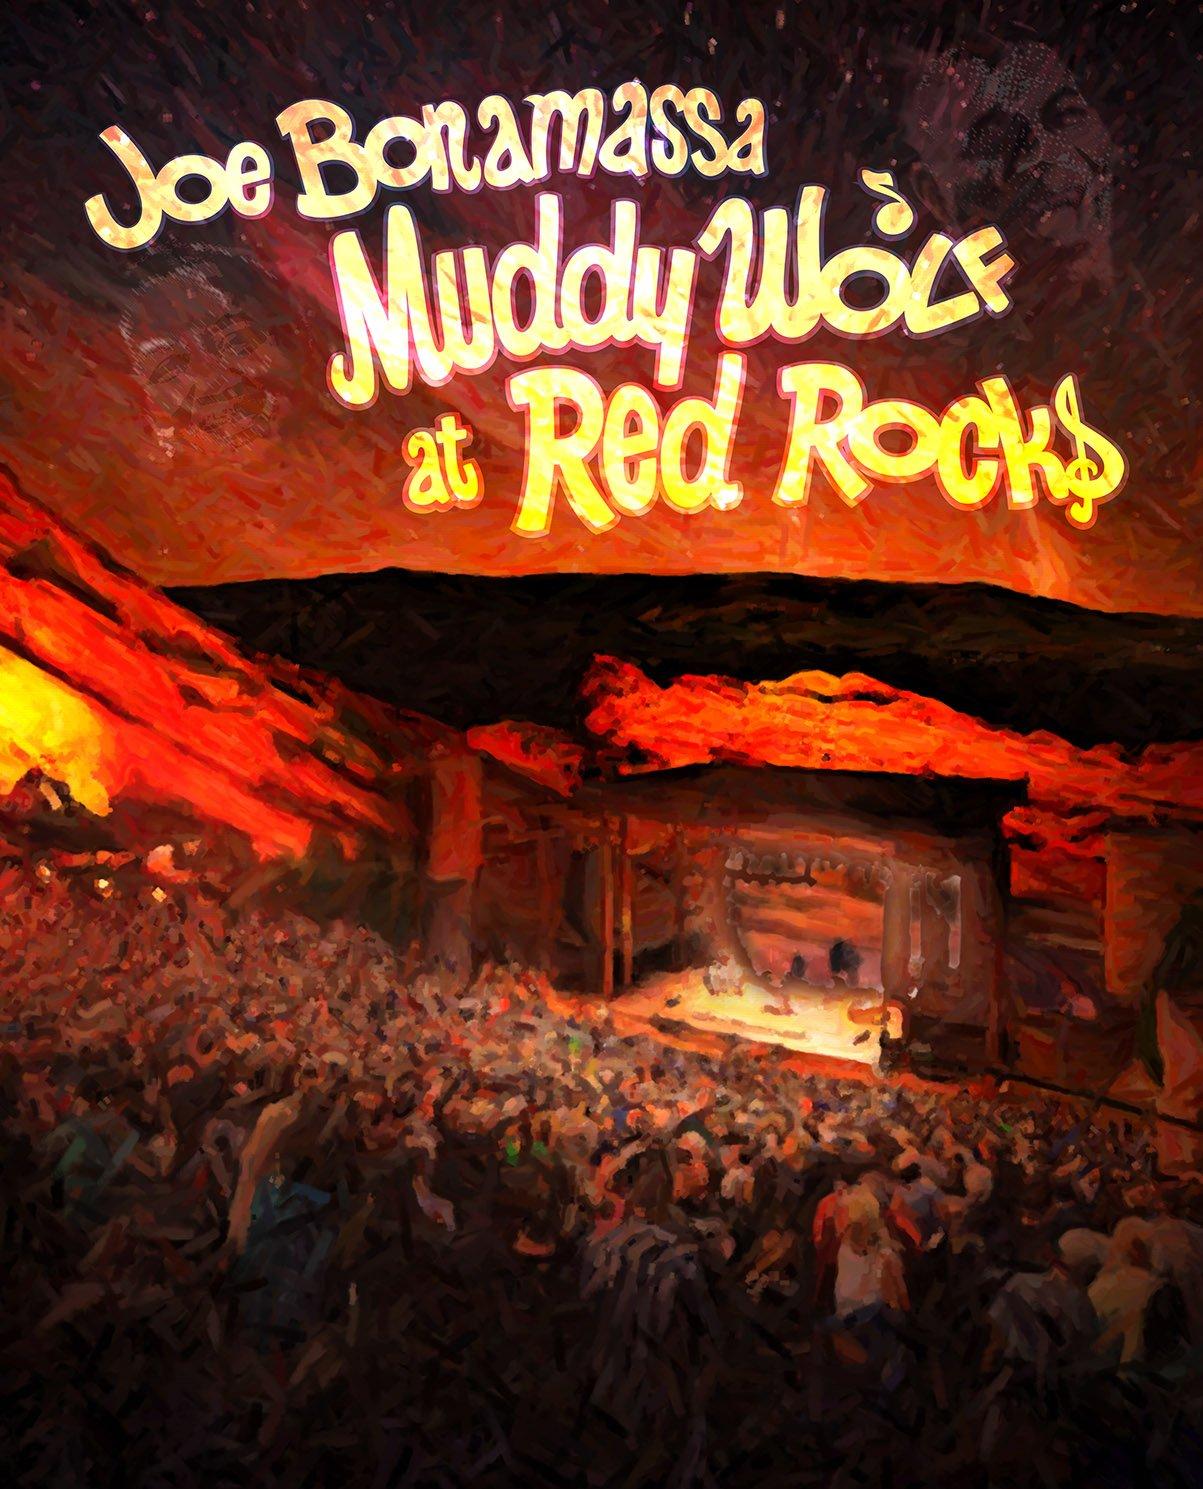 DVD : Joe Bonamassa - Muddy Wolf at Red Rocks (2 Disc)